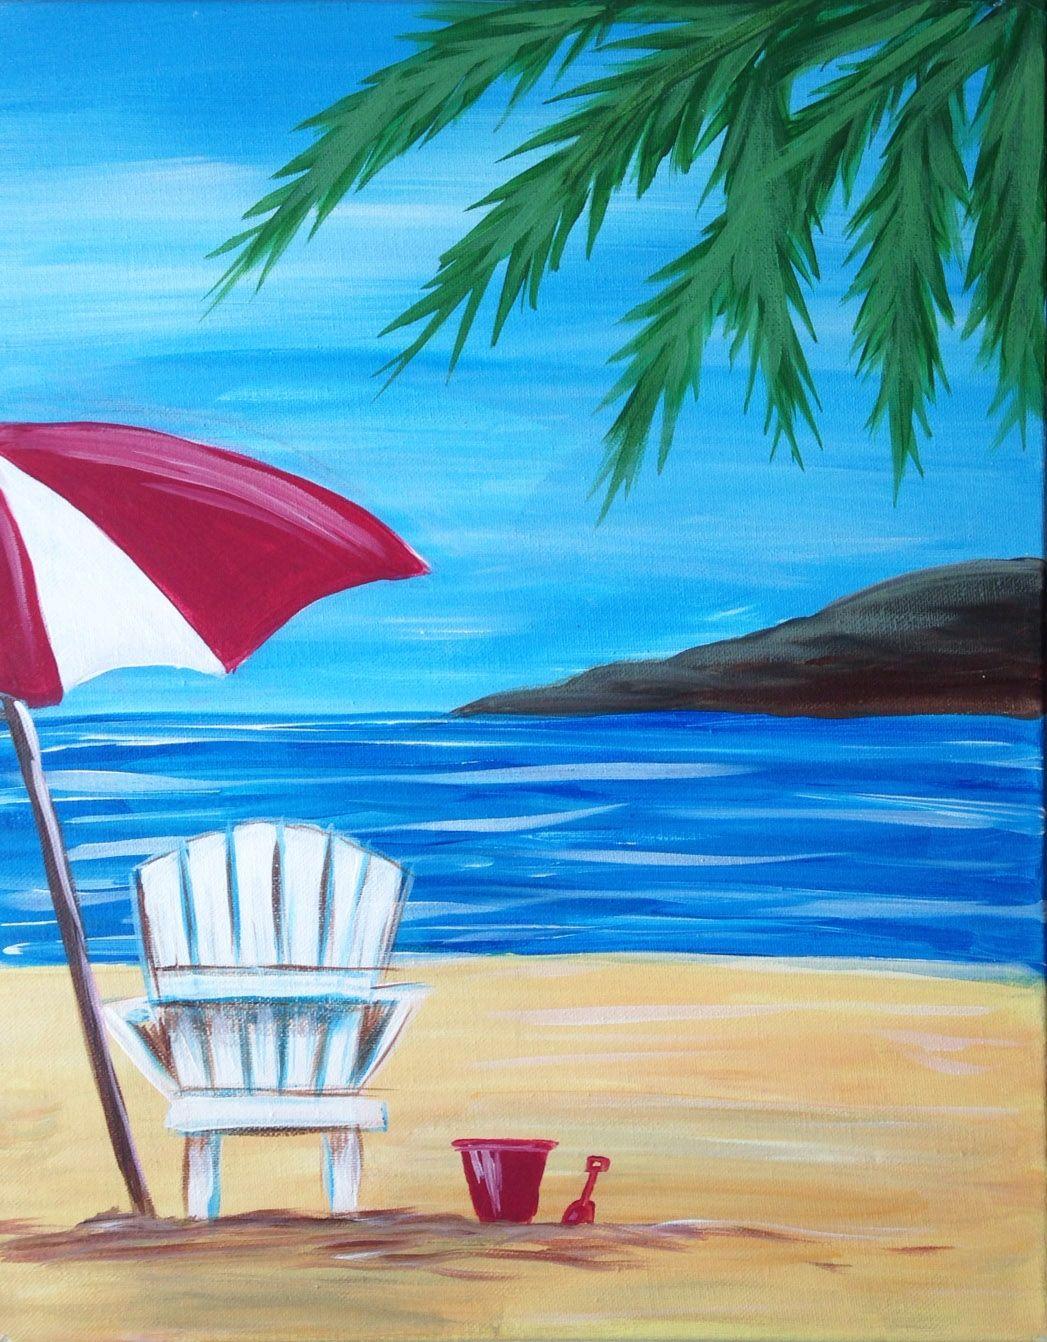 Beach chairs on the beach painting -